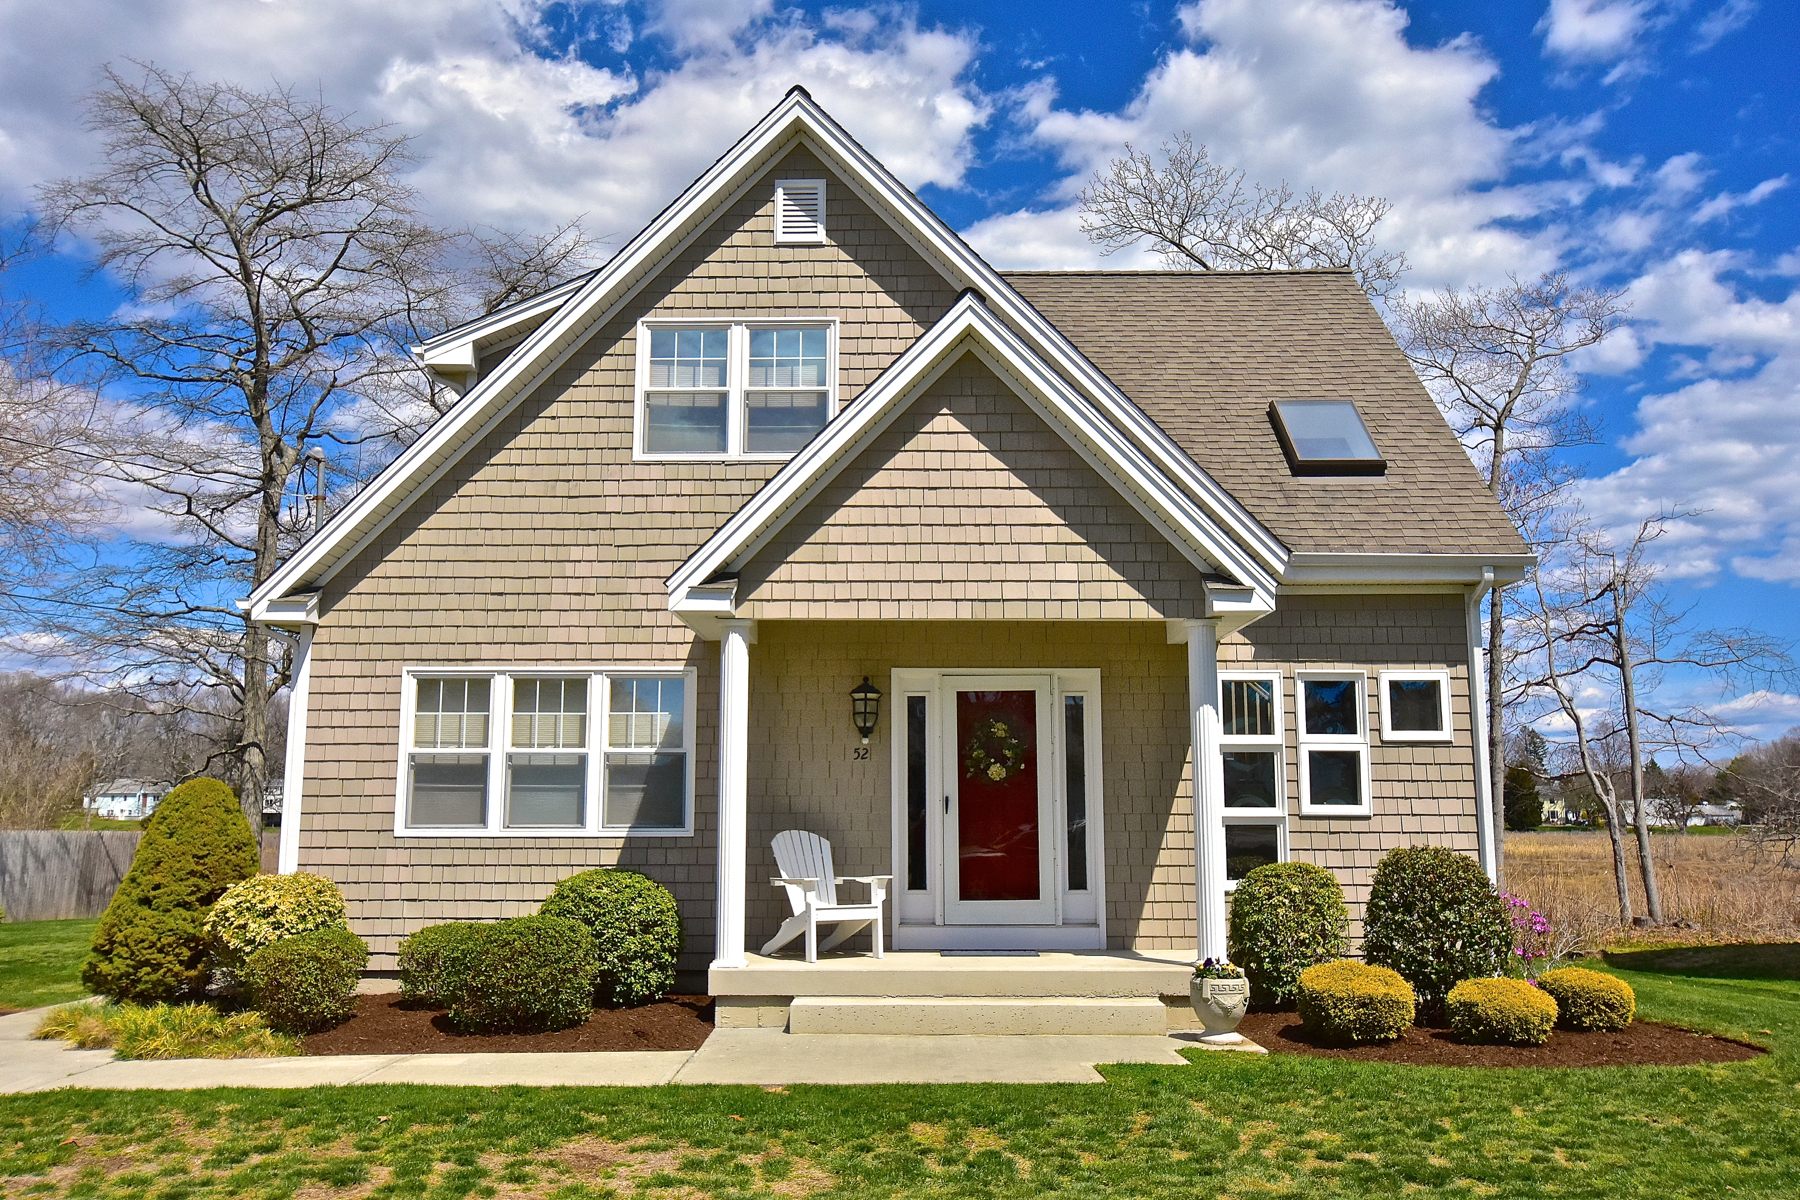 獨棟家庭住宅 為 出售 在 Year Round Home at Knollwood Beach 52 Neptune Dr Old Saybrook, 康涅狄格州 06475 美國